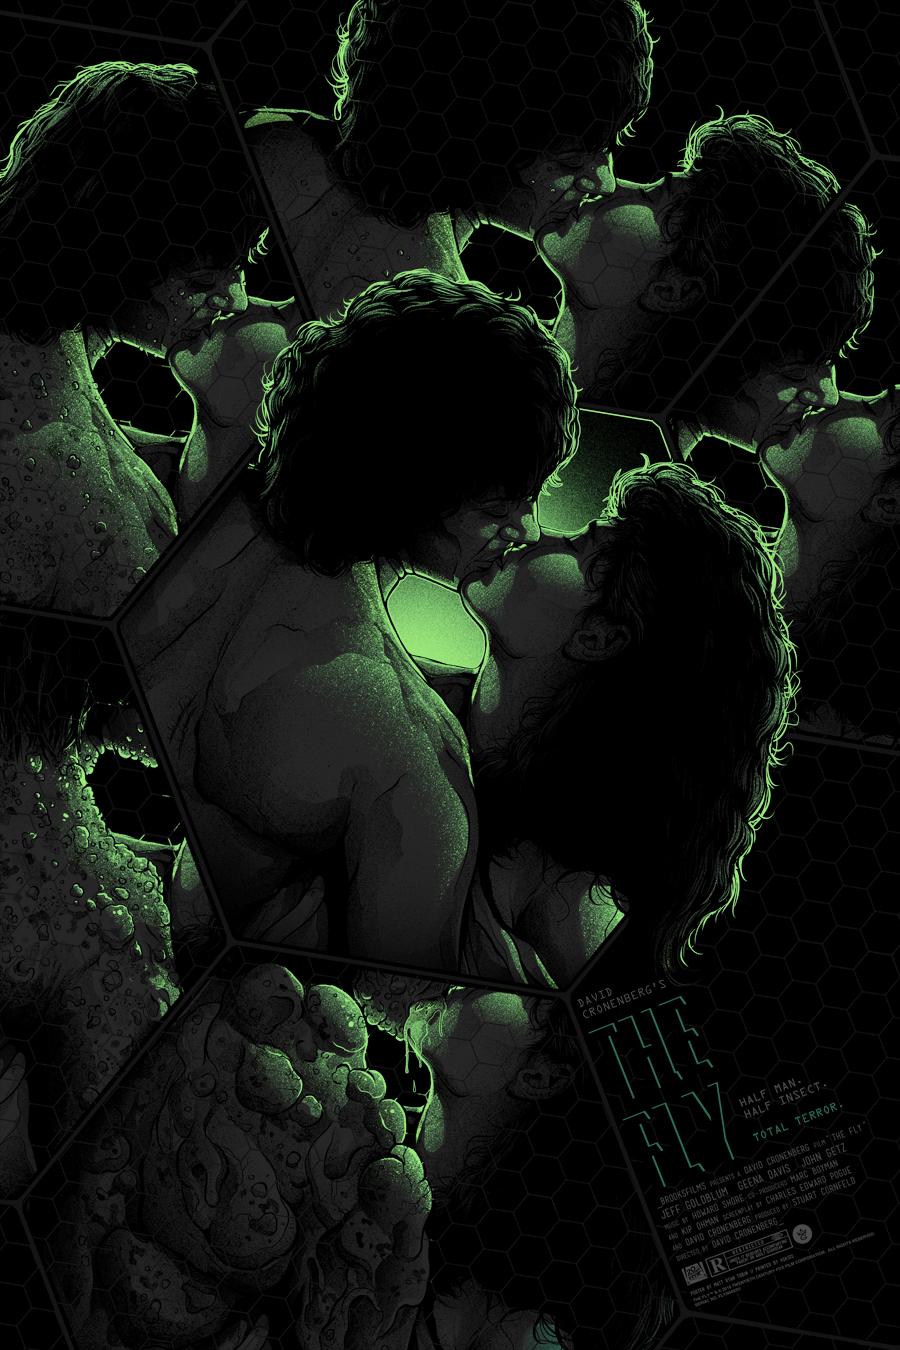 Variant image in the dark